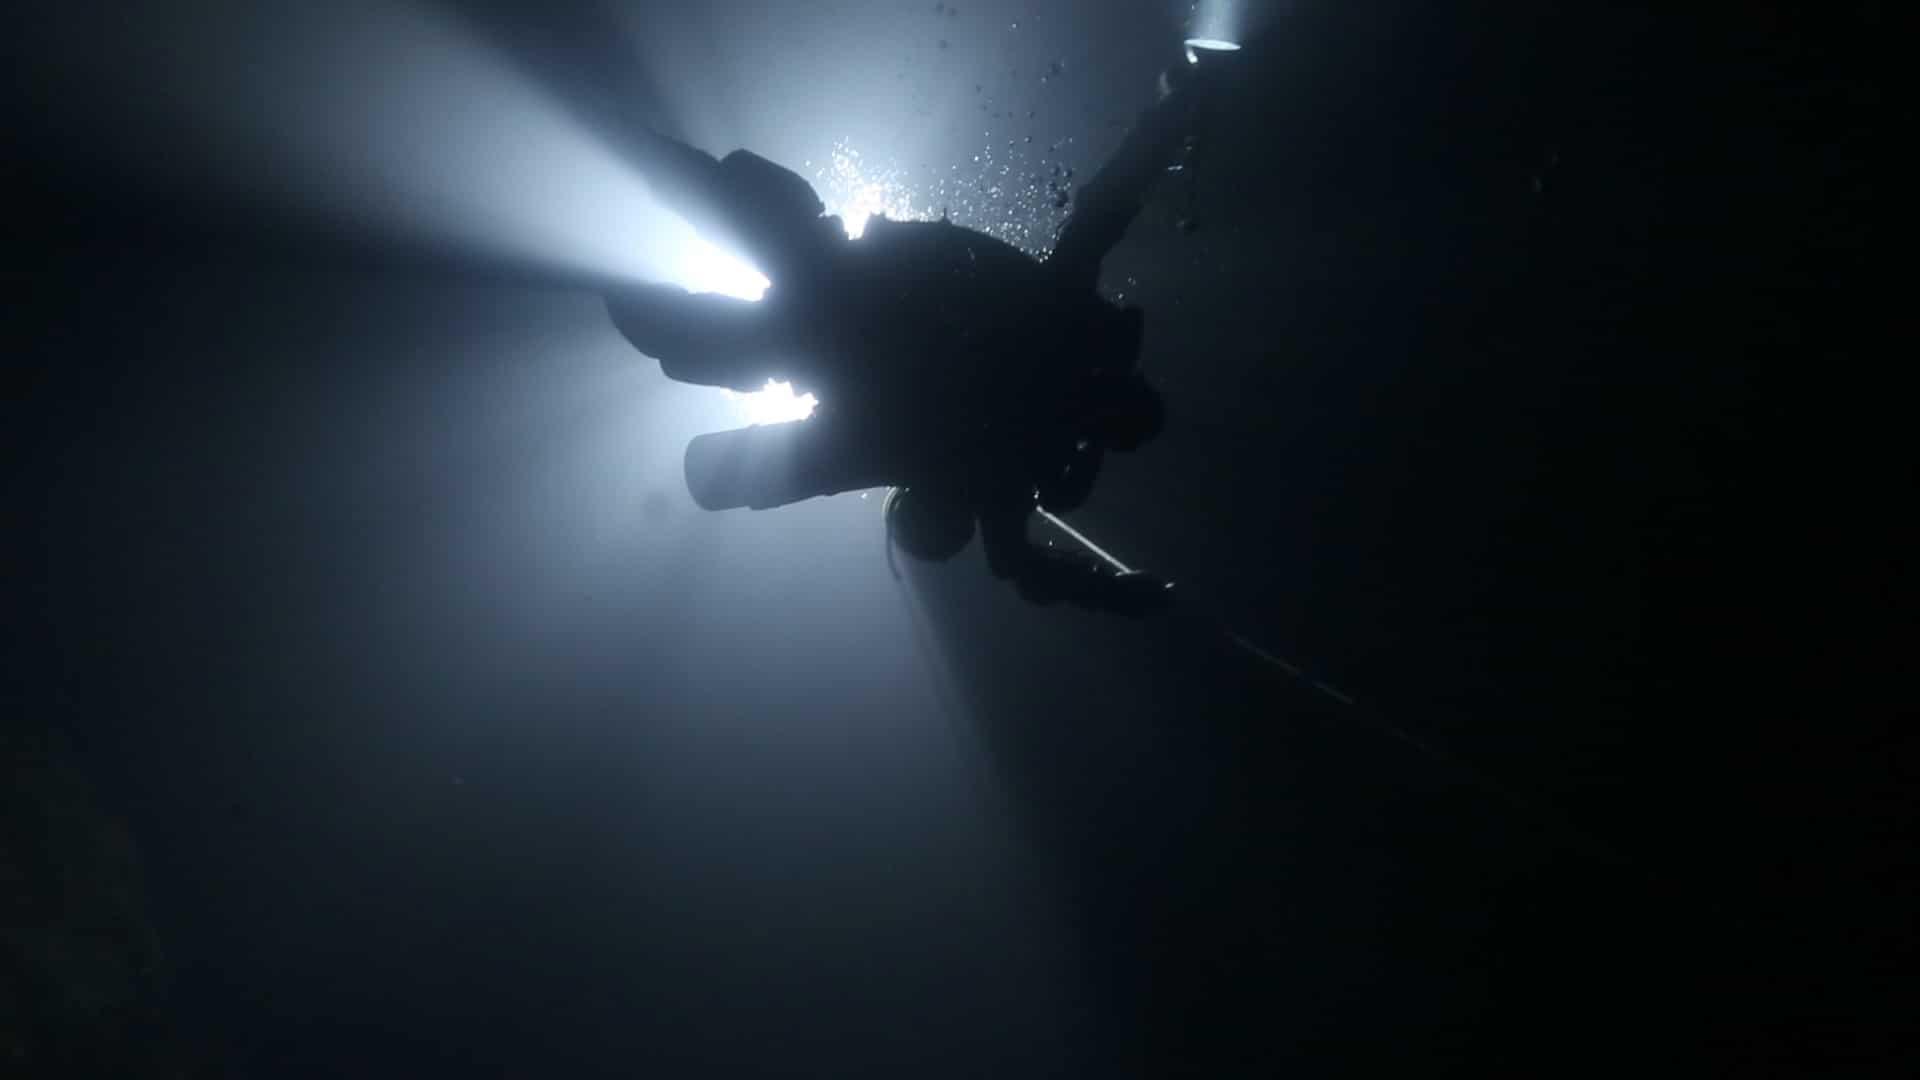 nurkowanie na dno jaskini Boesmansgat divers24.pl